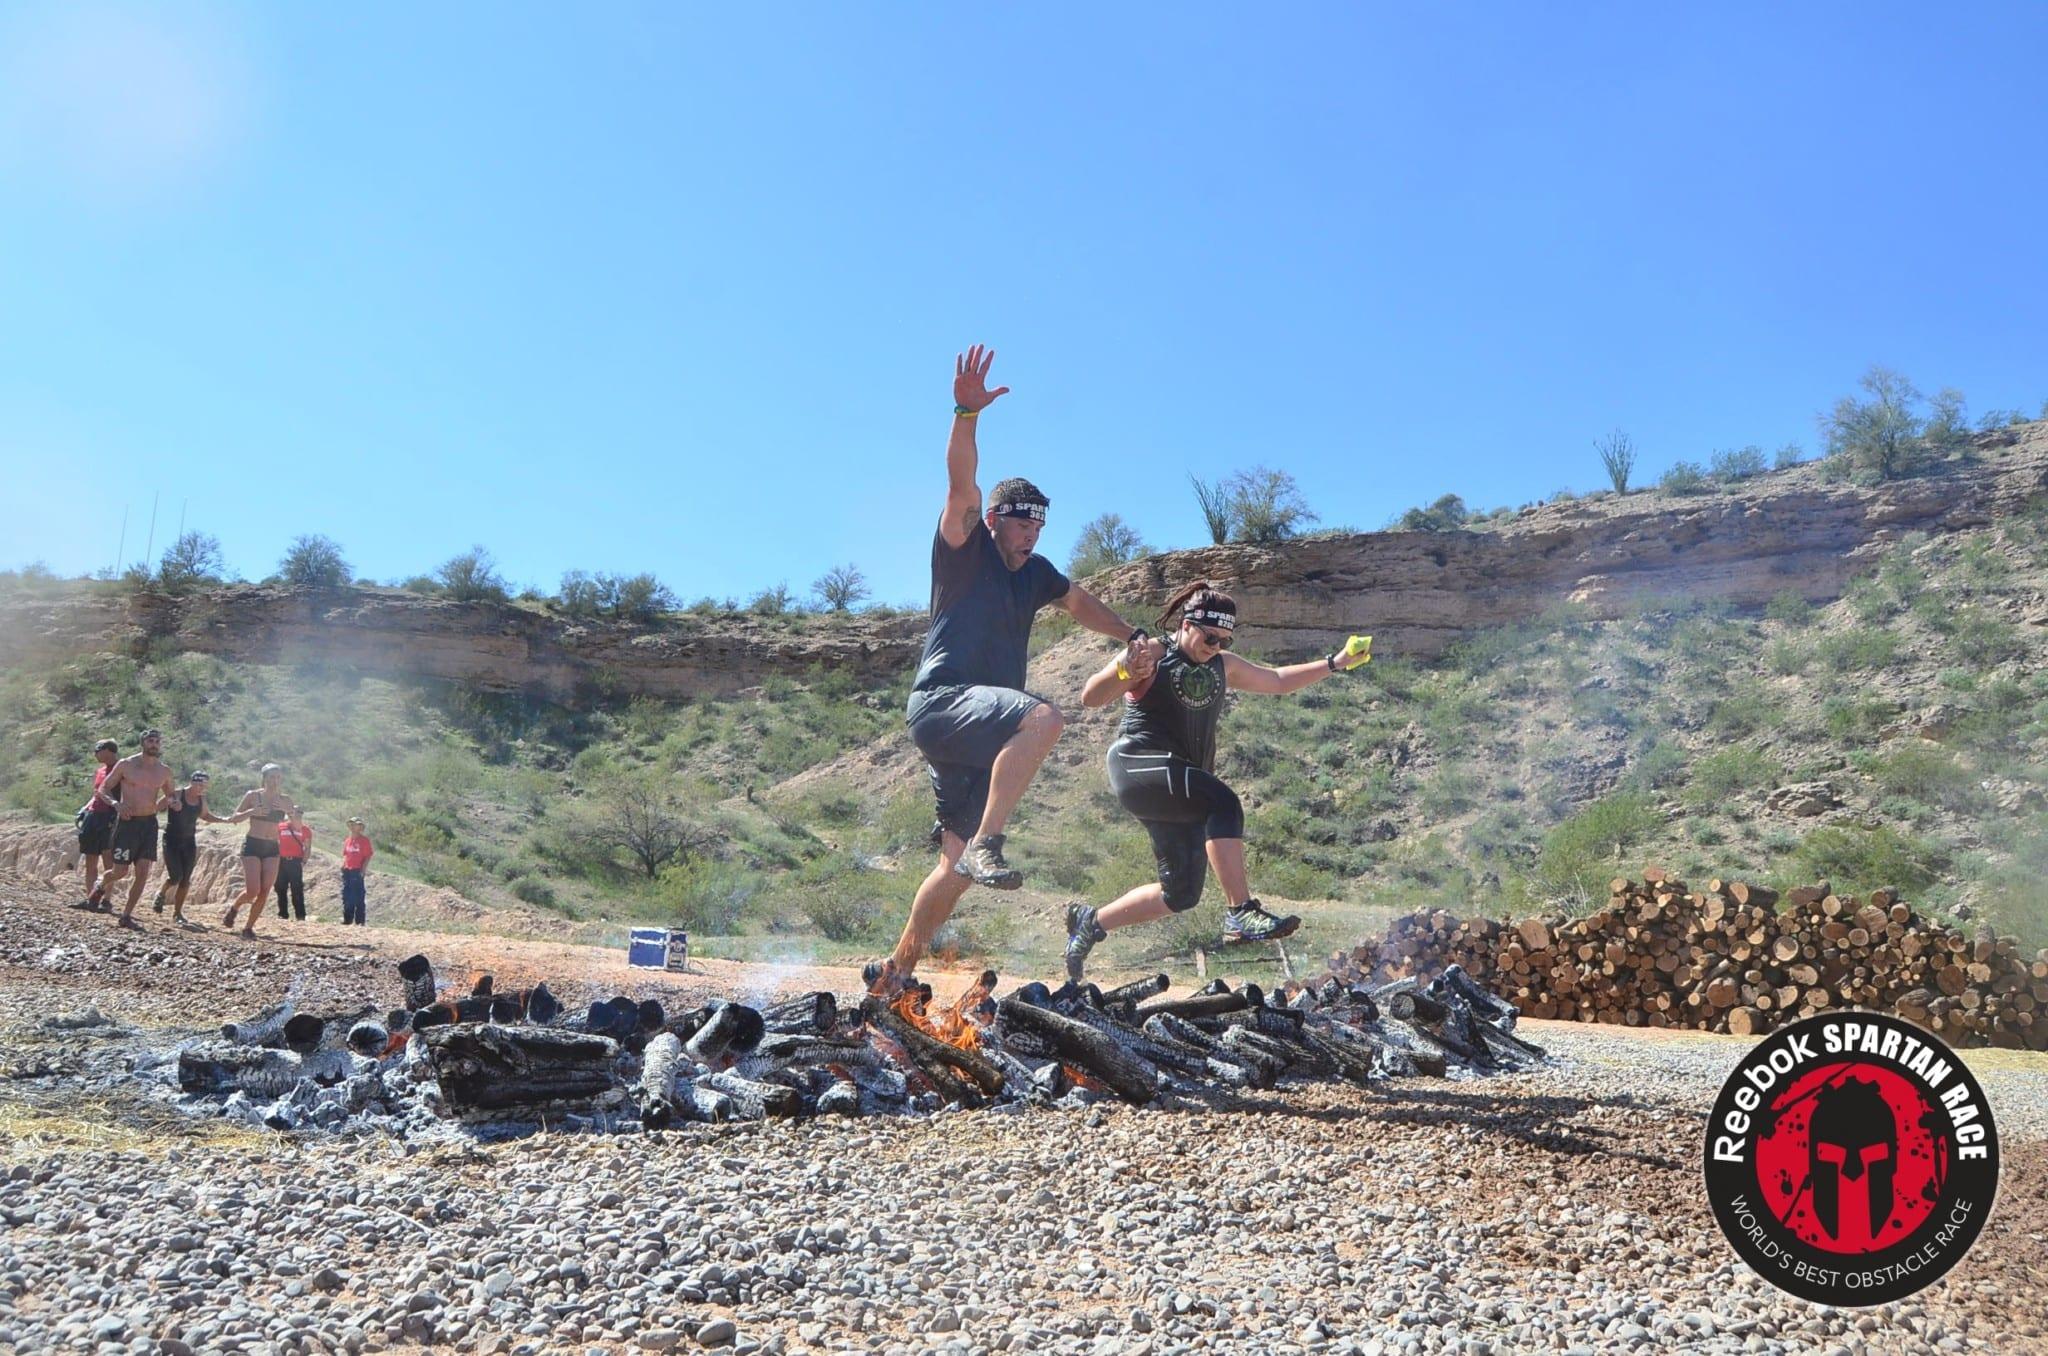 Arizona Spartan Fire jump